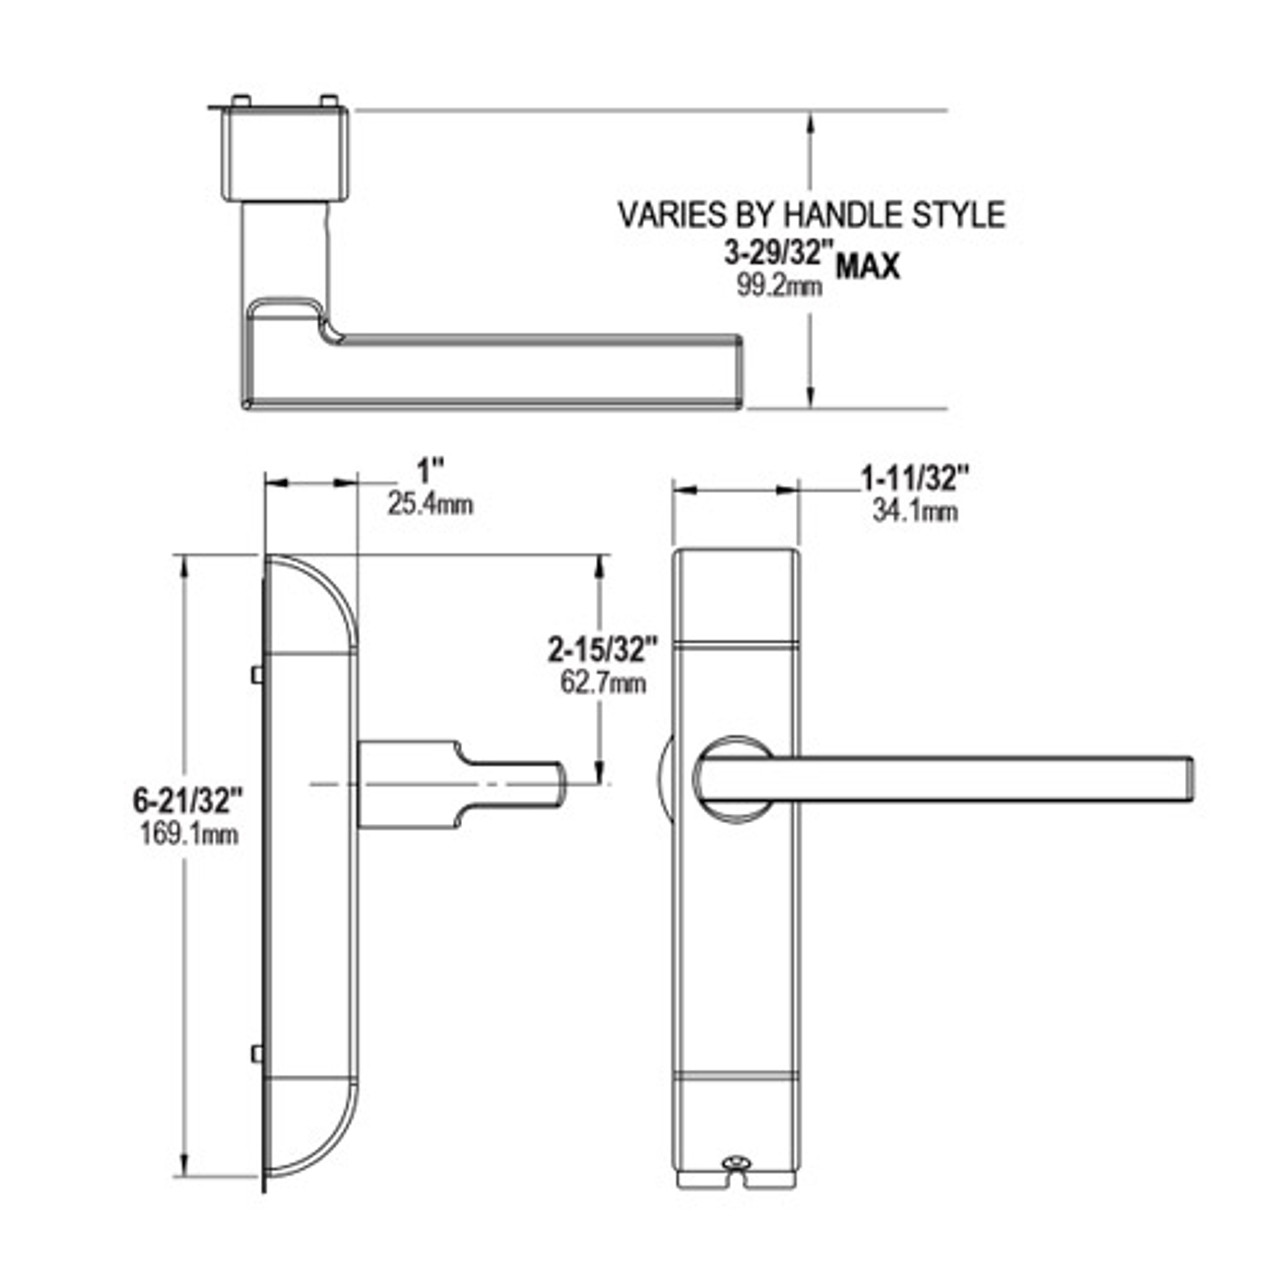 4600M-MV-552-US10B Adams Rite MV Designer handle Dimensional View